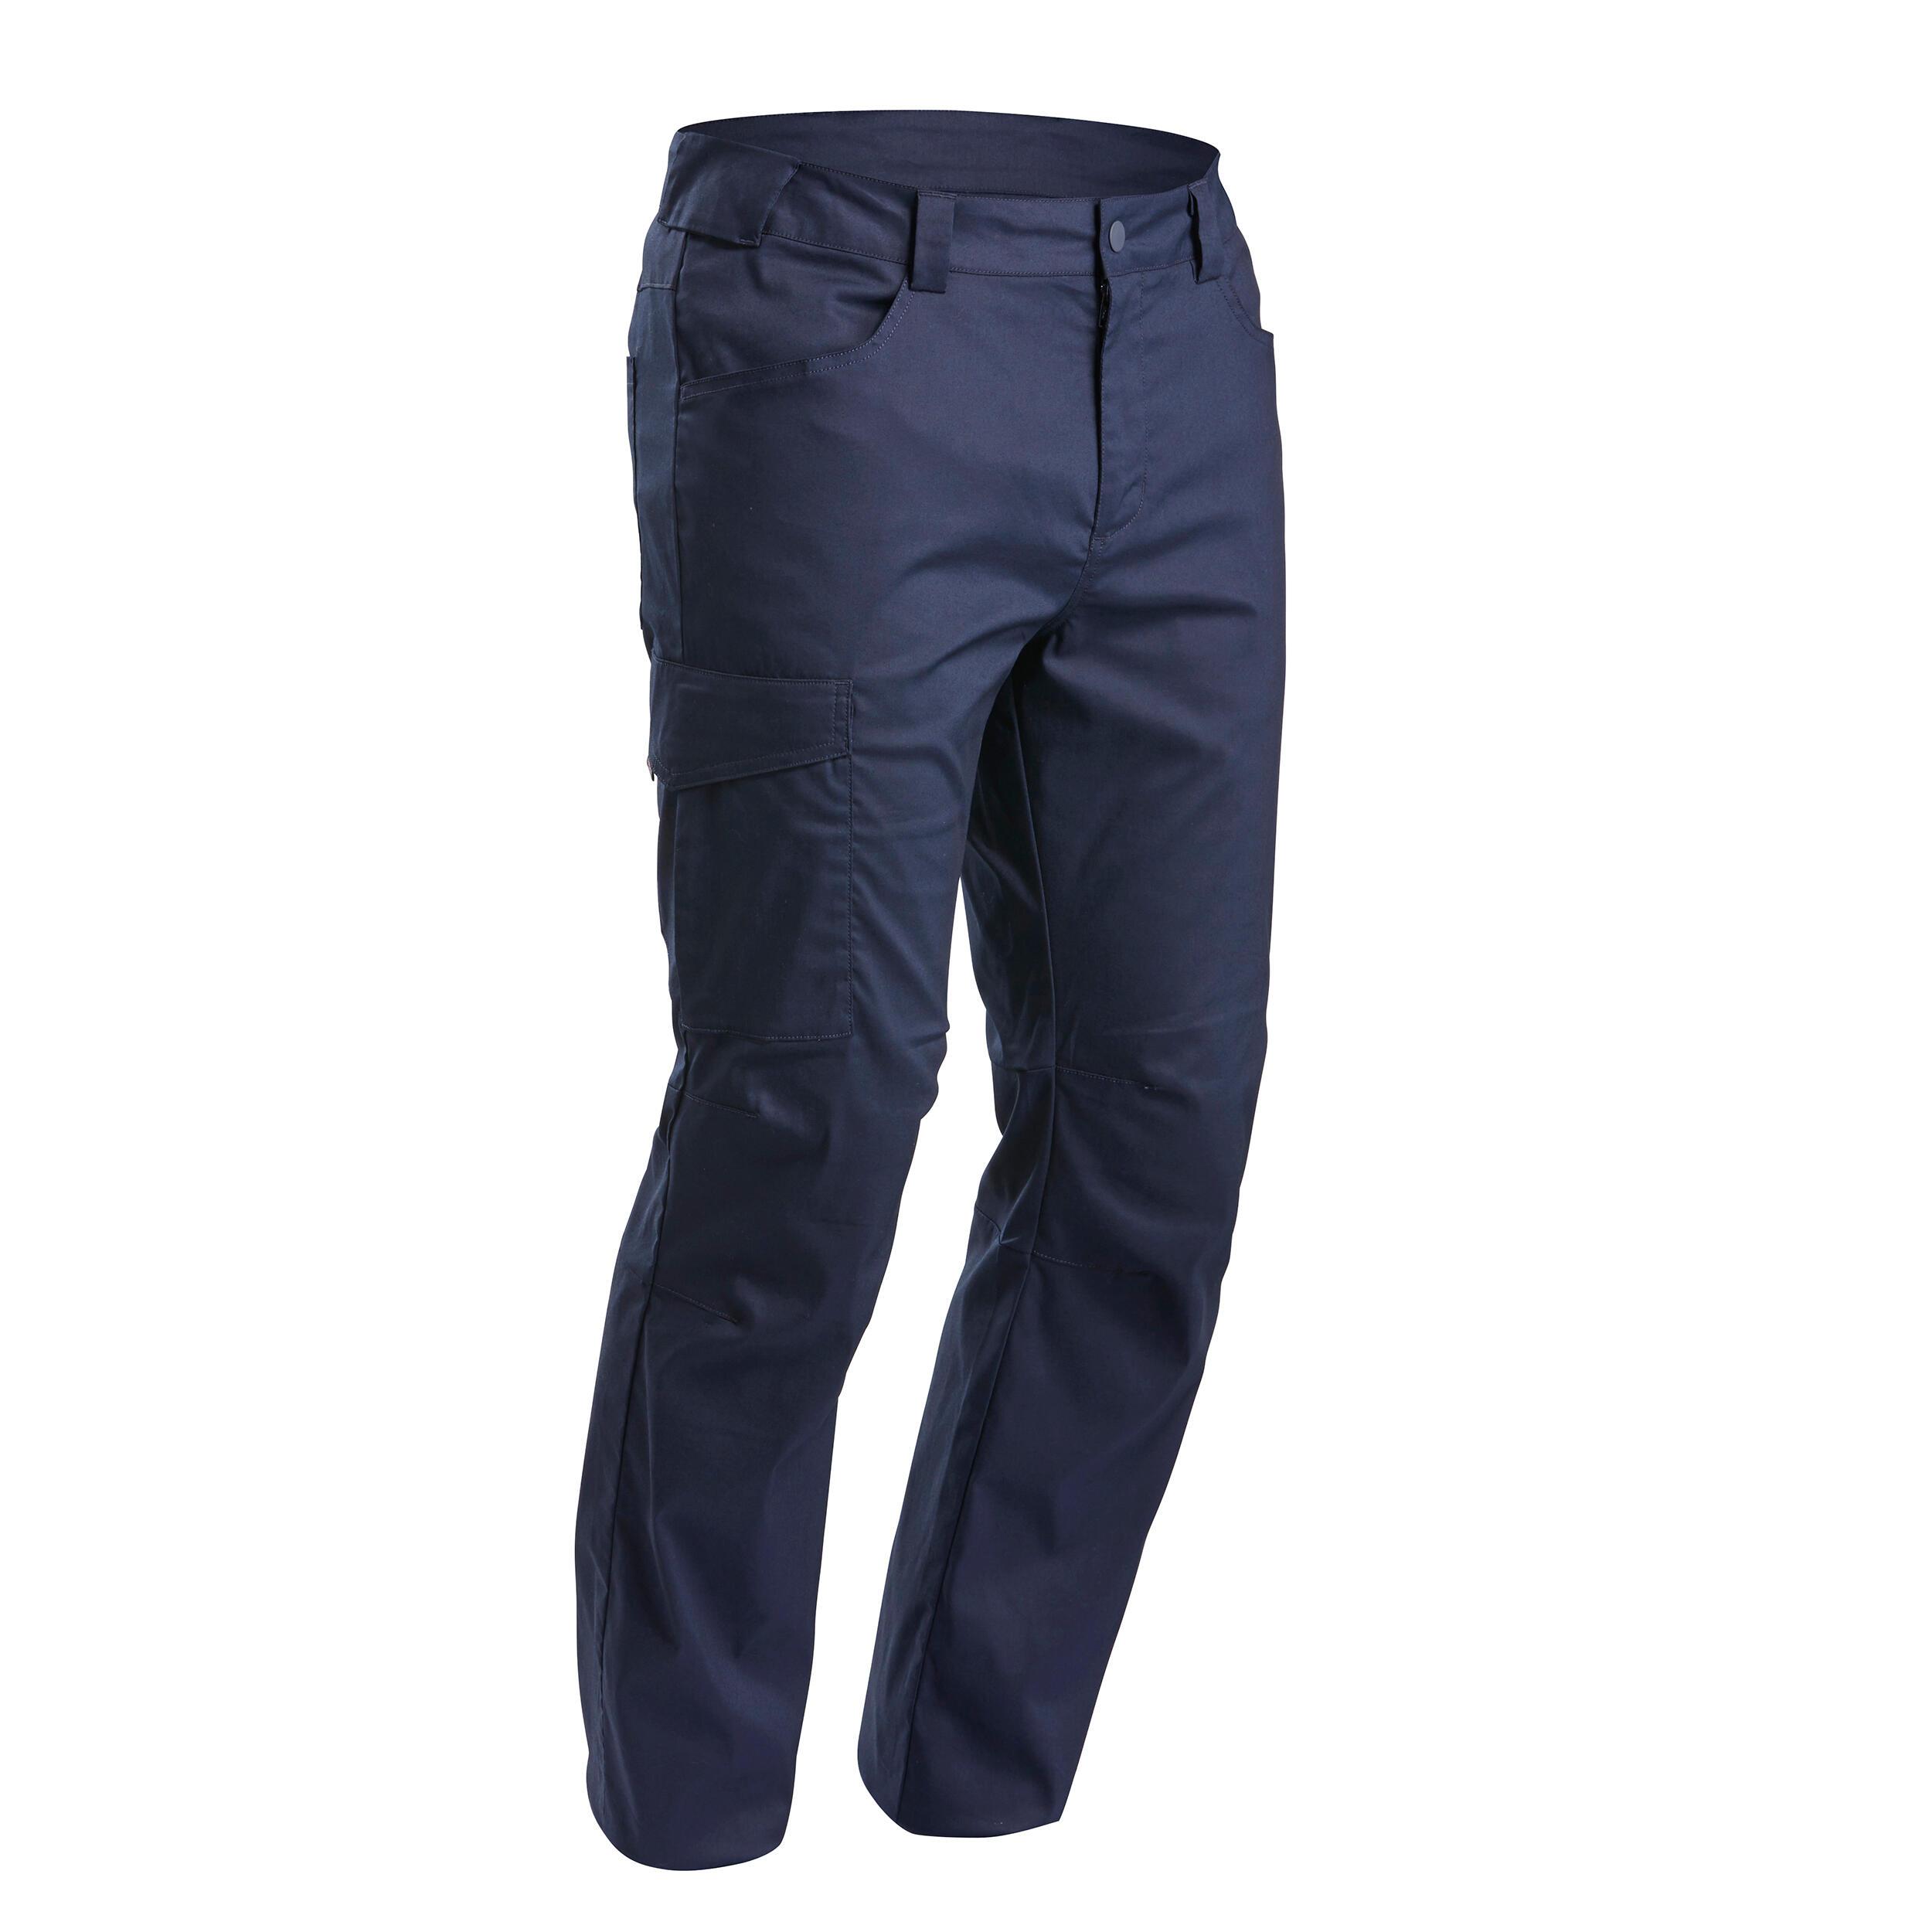 Pantalon Drumeție NH100 la Reducere poza